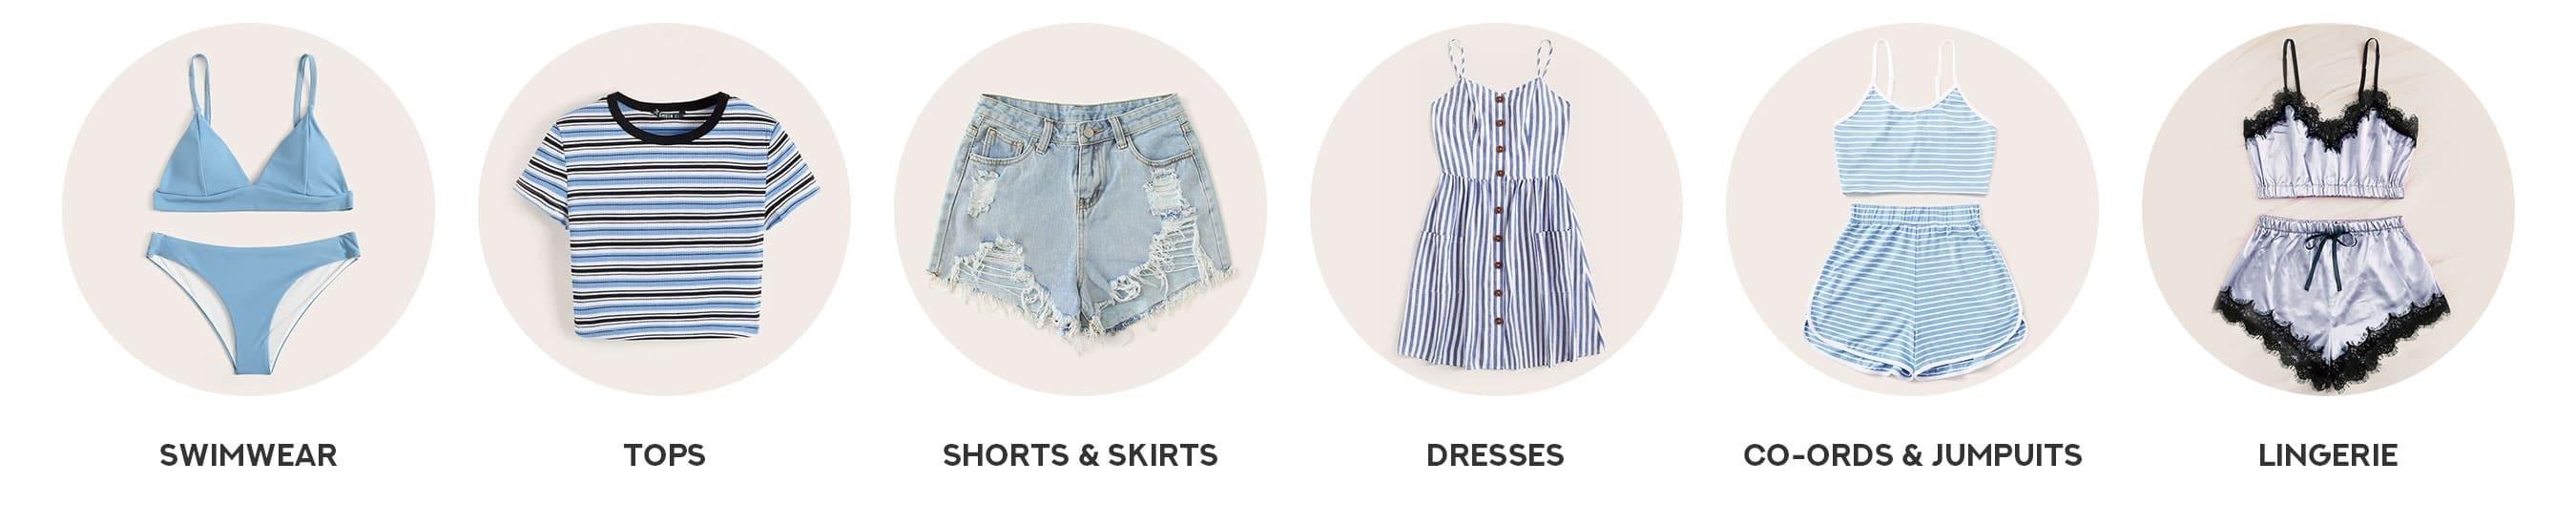 299f32cdf7b Shop The Latest Girls & Guys Fashion Trends at ROMWE